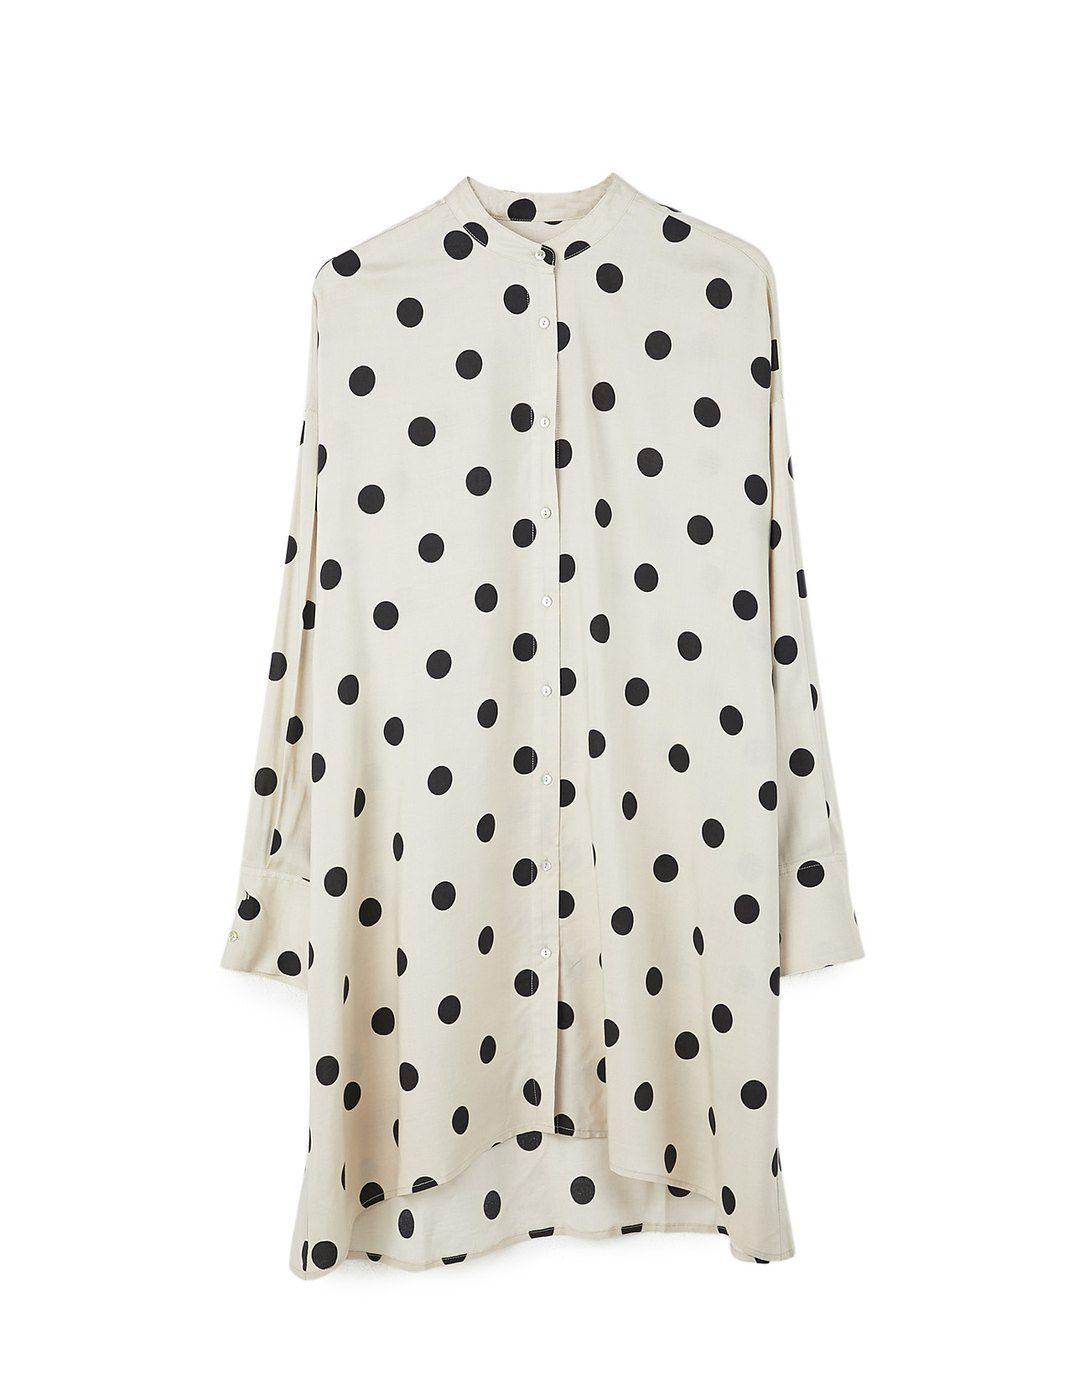 8b033250710 Stripe Shirt Dress - Dresses